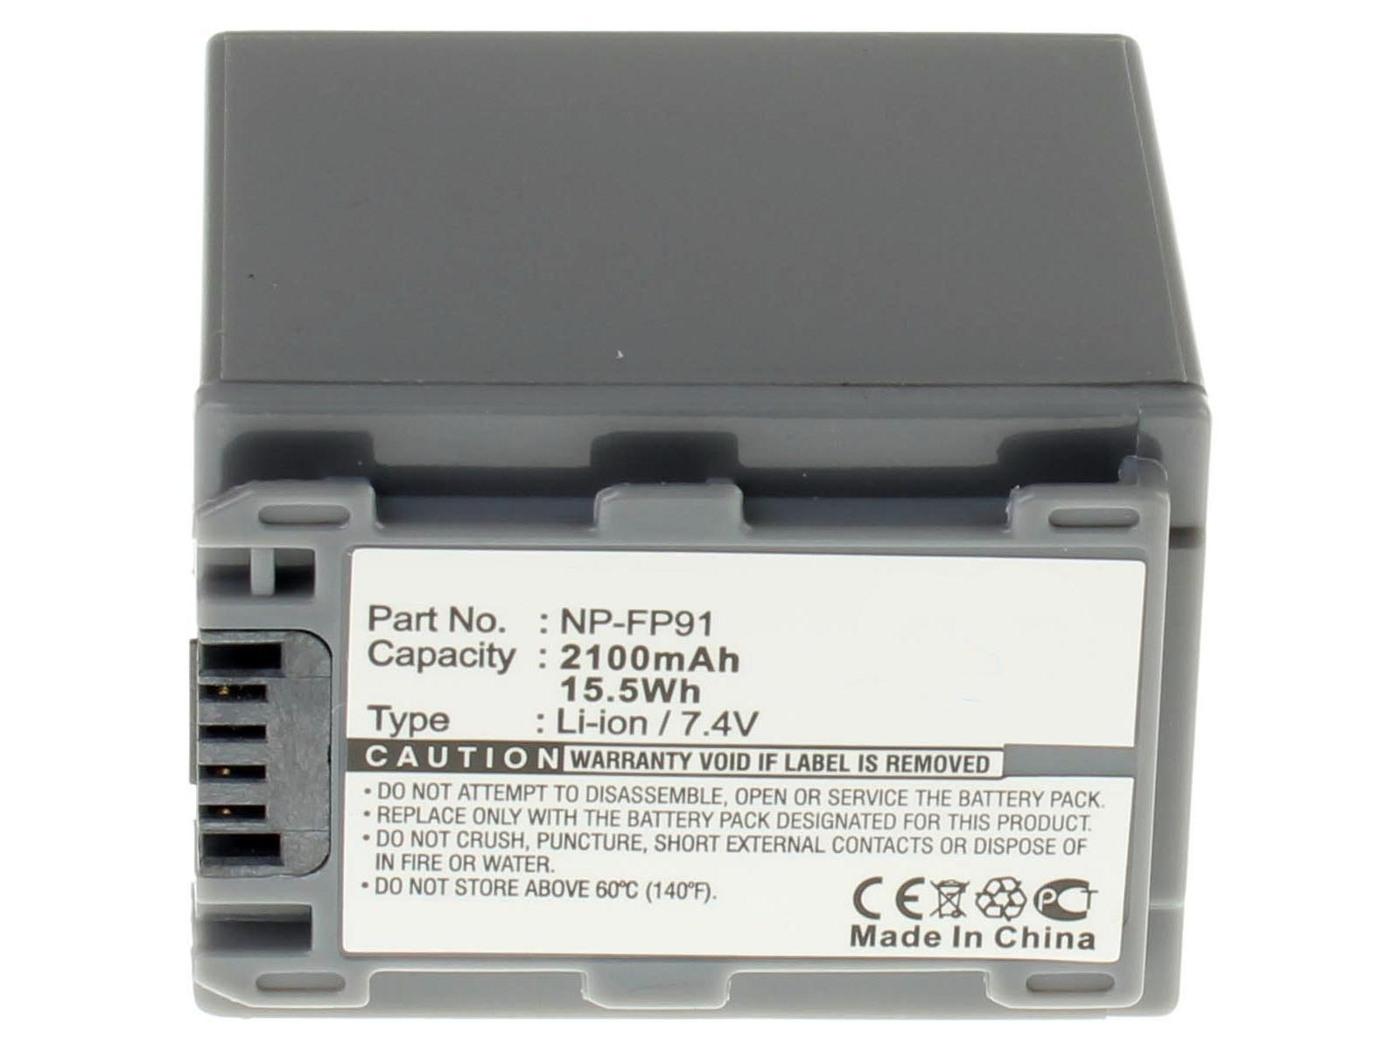 Аккумуляторная батарея iBatt iB-T1-F282 2300mAh для камер Sony HDR-HC3, DCR-SR60, DCR-HC23E, DCR-HC17E, DCR-HC26E, DCR-HC35E, DCR-HC30E, DCR-HC96E, DCR-HC18E, DCR-HC32E, DCR-HC19E, DCR-DVD105E, DCR-HC46E, DCR-HC42E, DCR-DVD405E, DCR-HC96, DCR-HC26,